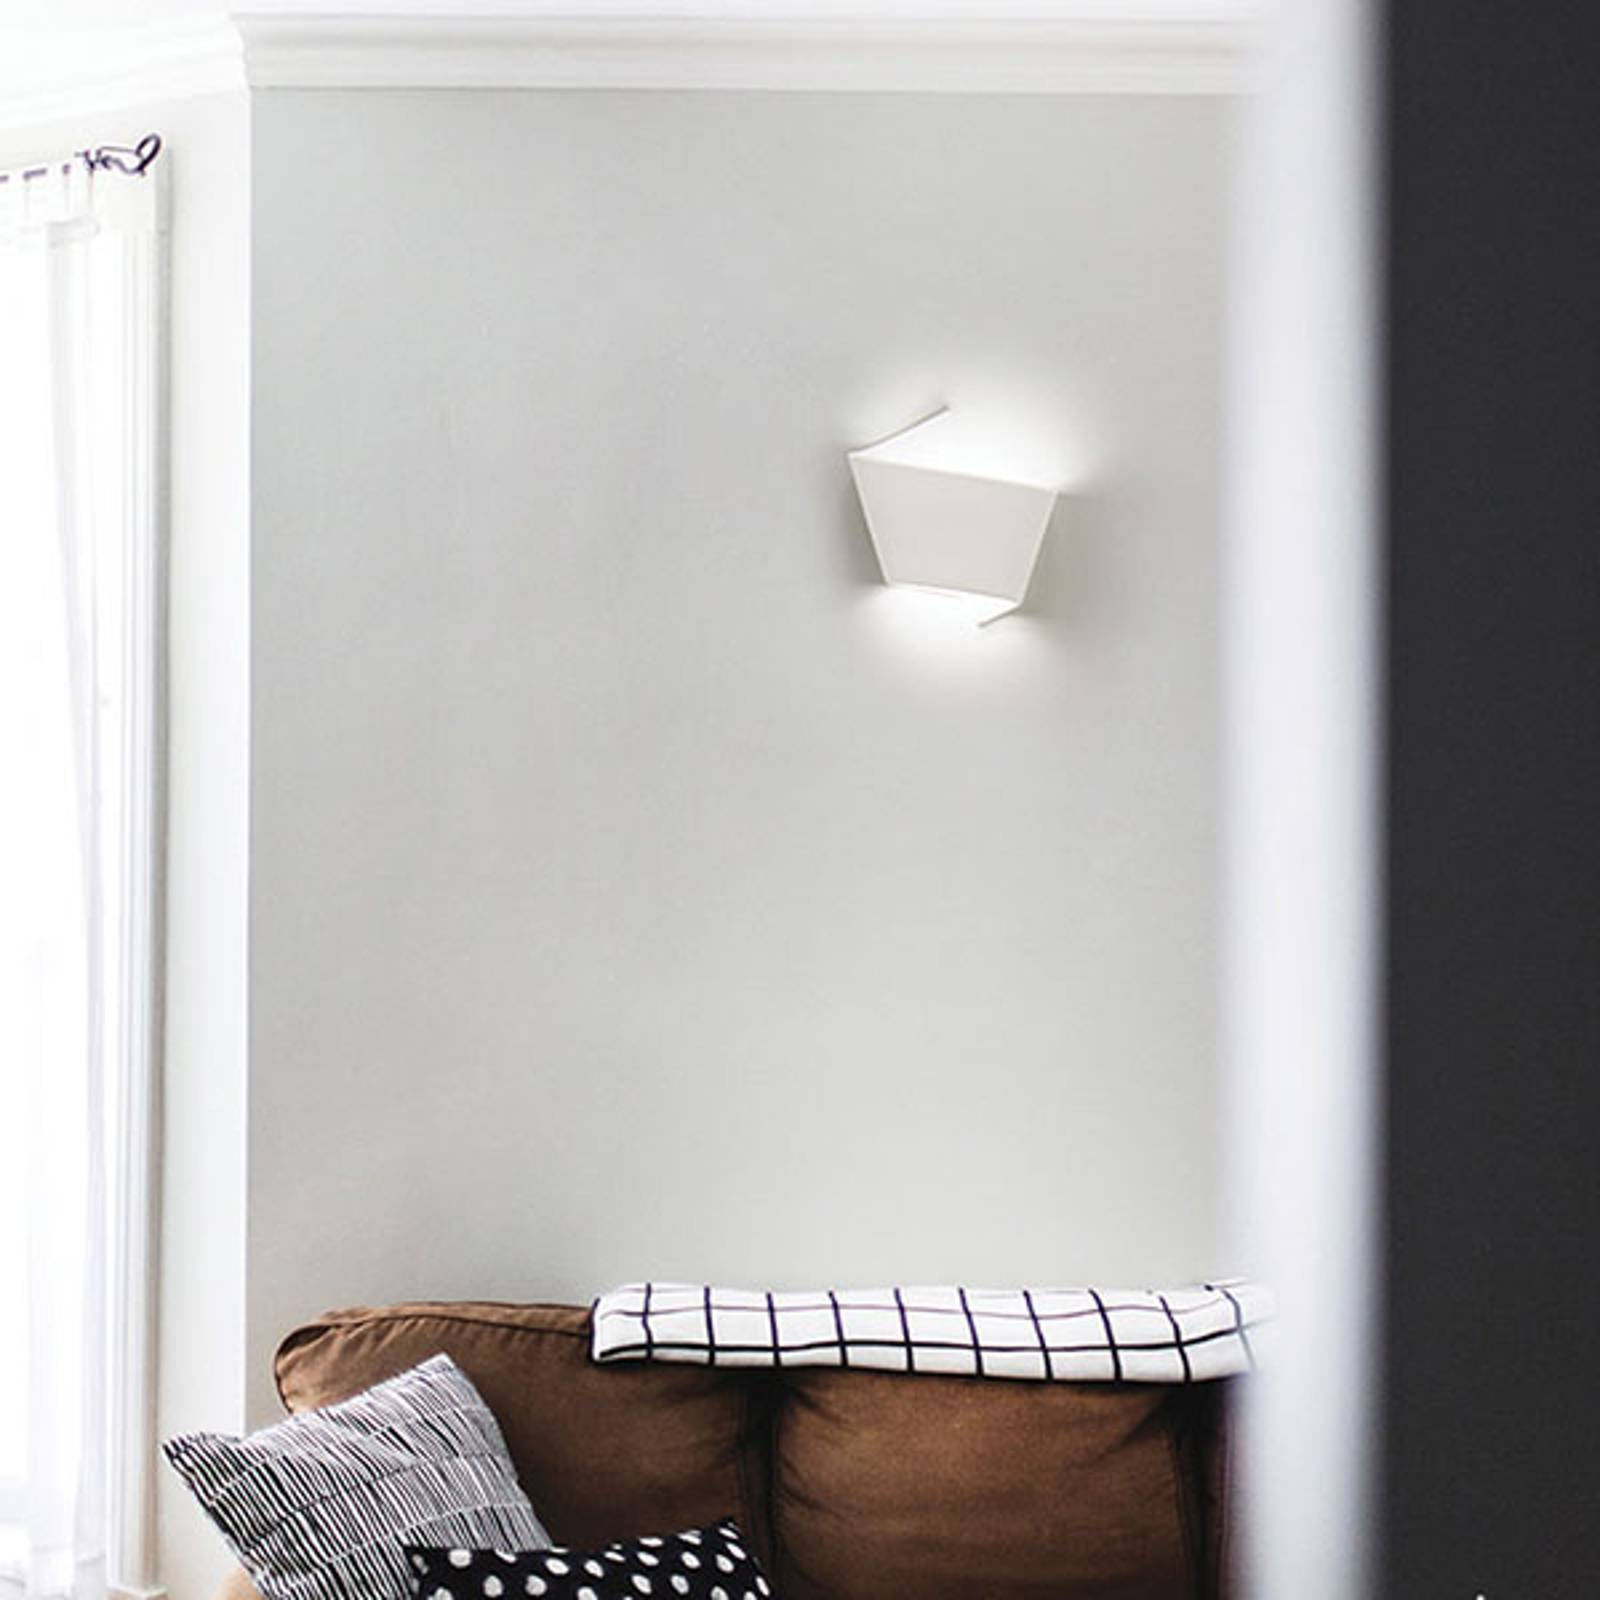 LED-vegglampe 2498, keramikk 2 700 K, dimbar